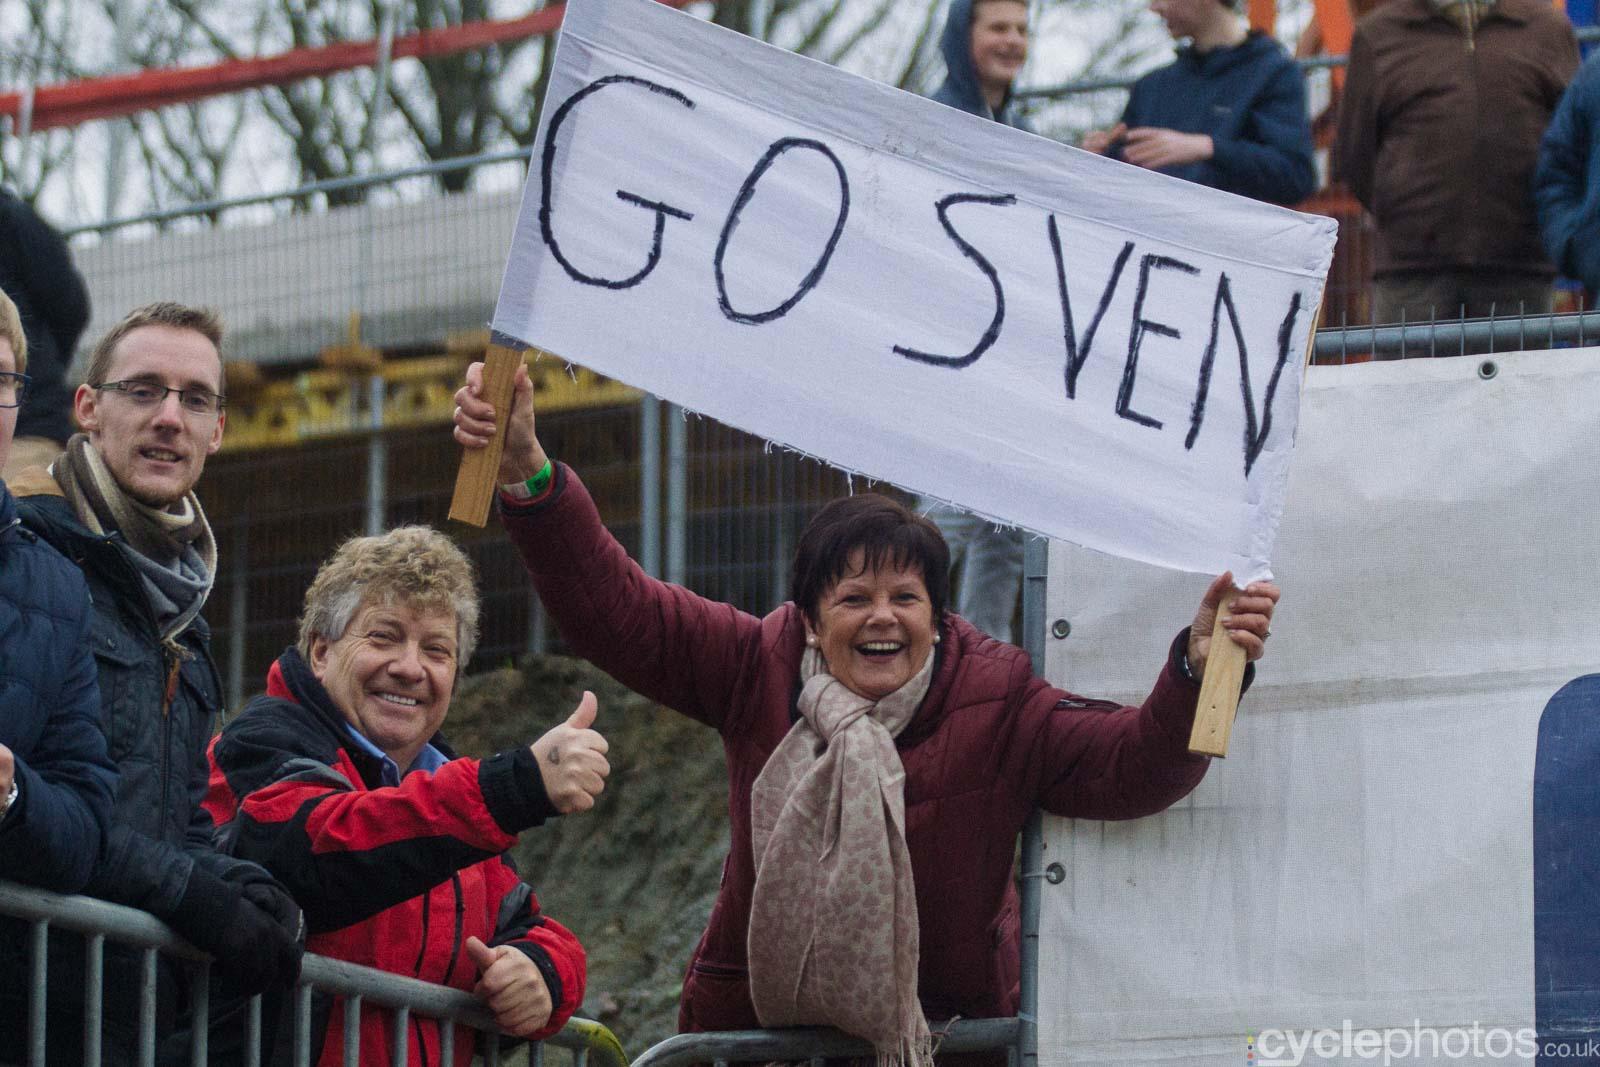 2016-cyclephotos-cyclocross-gpsvennys-152748-sven-nys-supporters